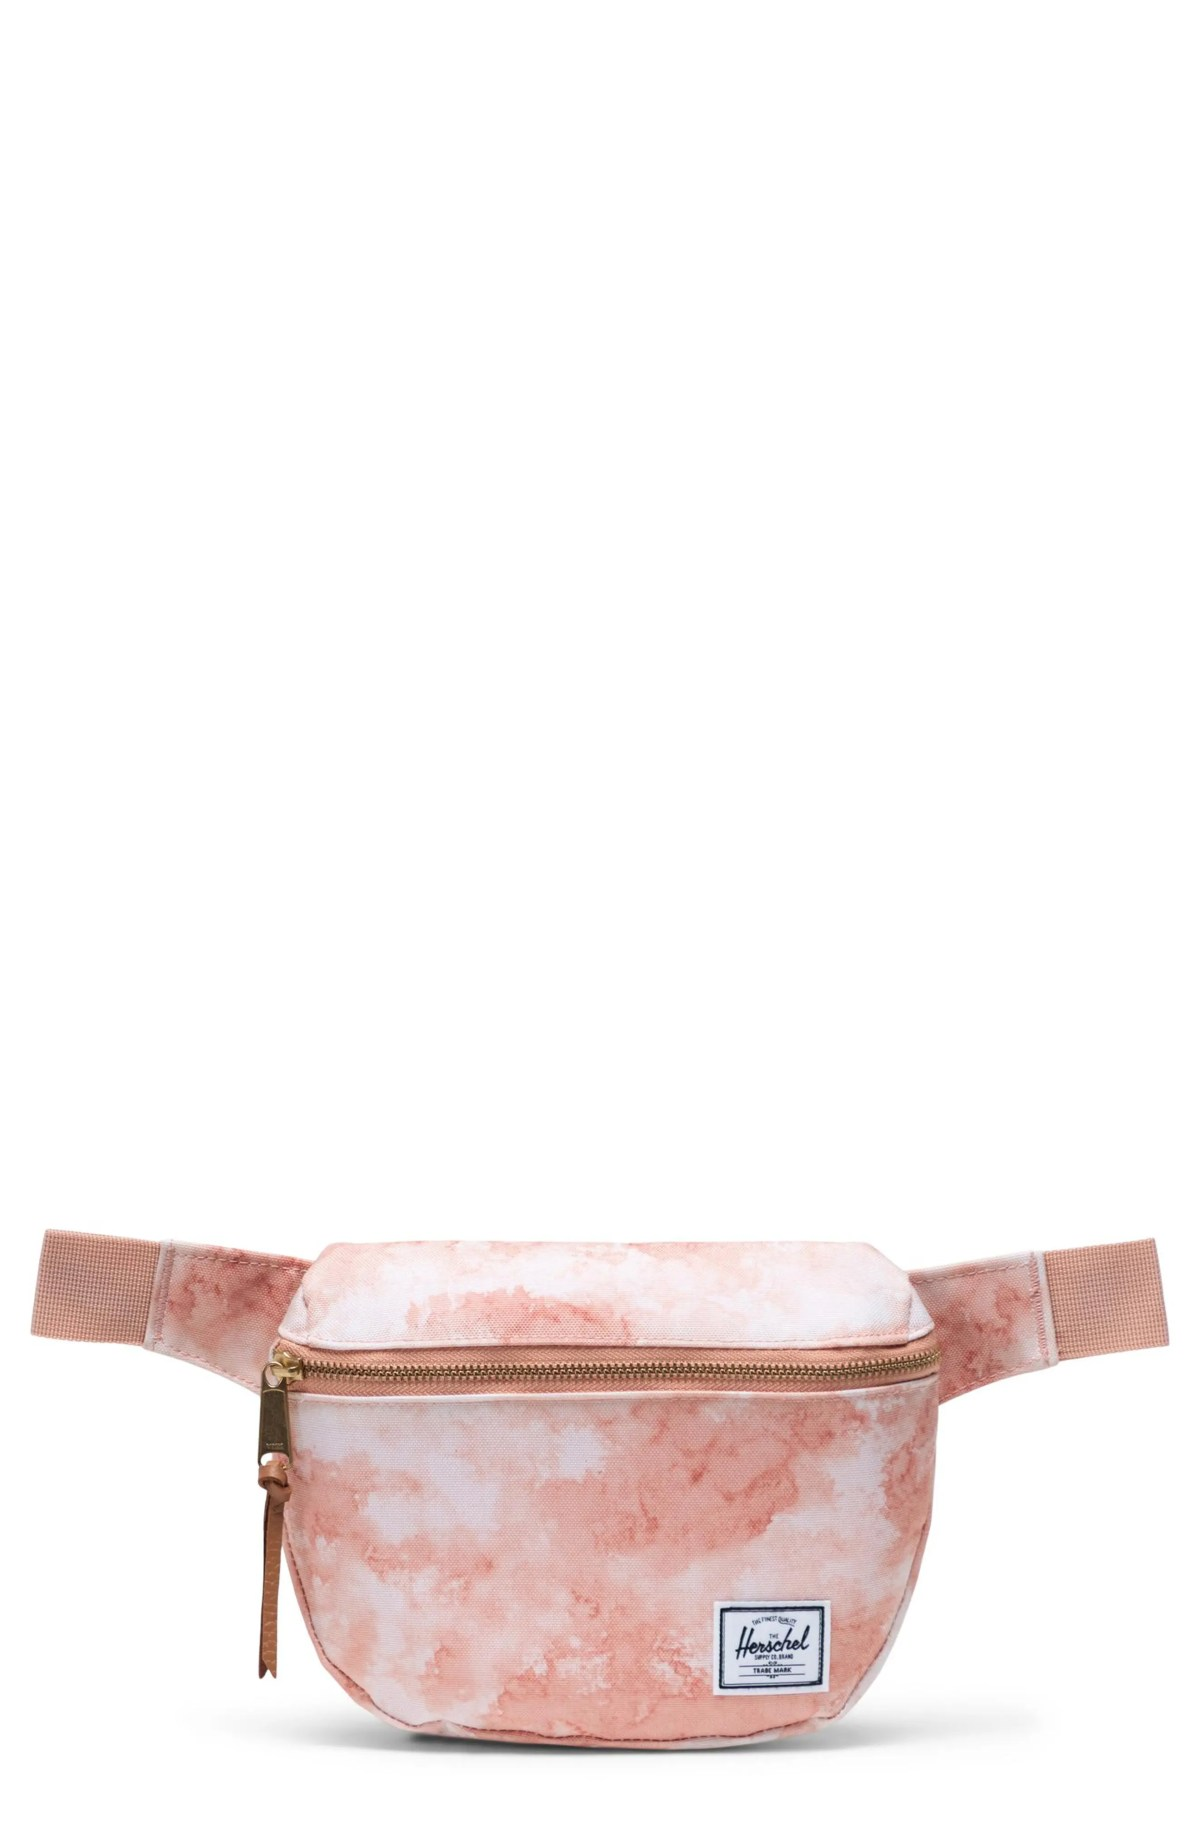 HERSCHEL SUPPLY CO. Fifteen Belt Bag, Main, color, PASTEL CLOUD PAPAYA